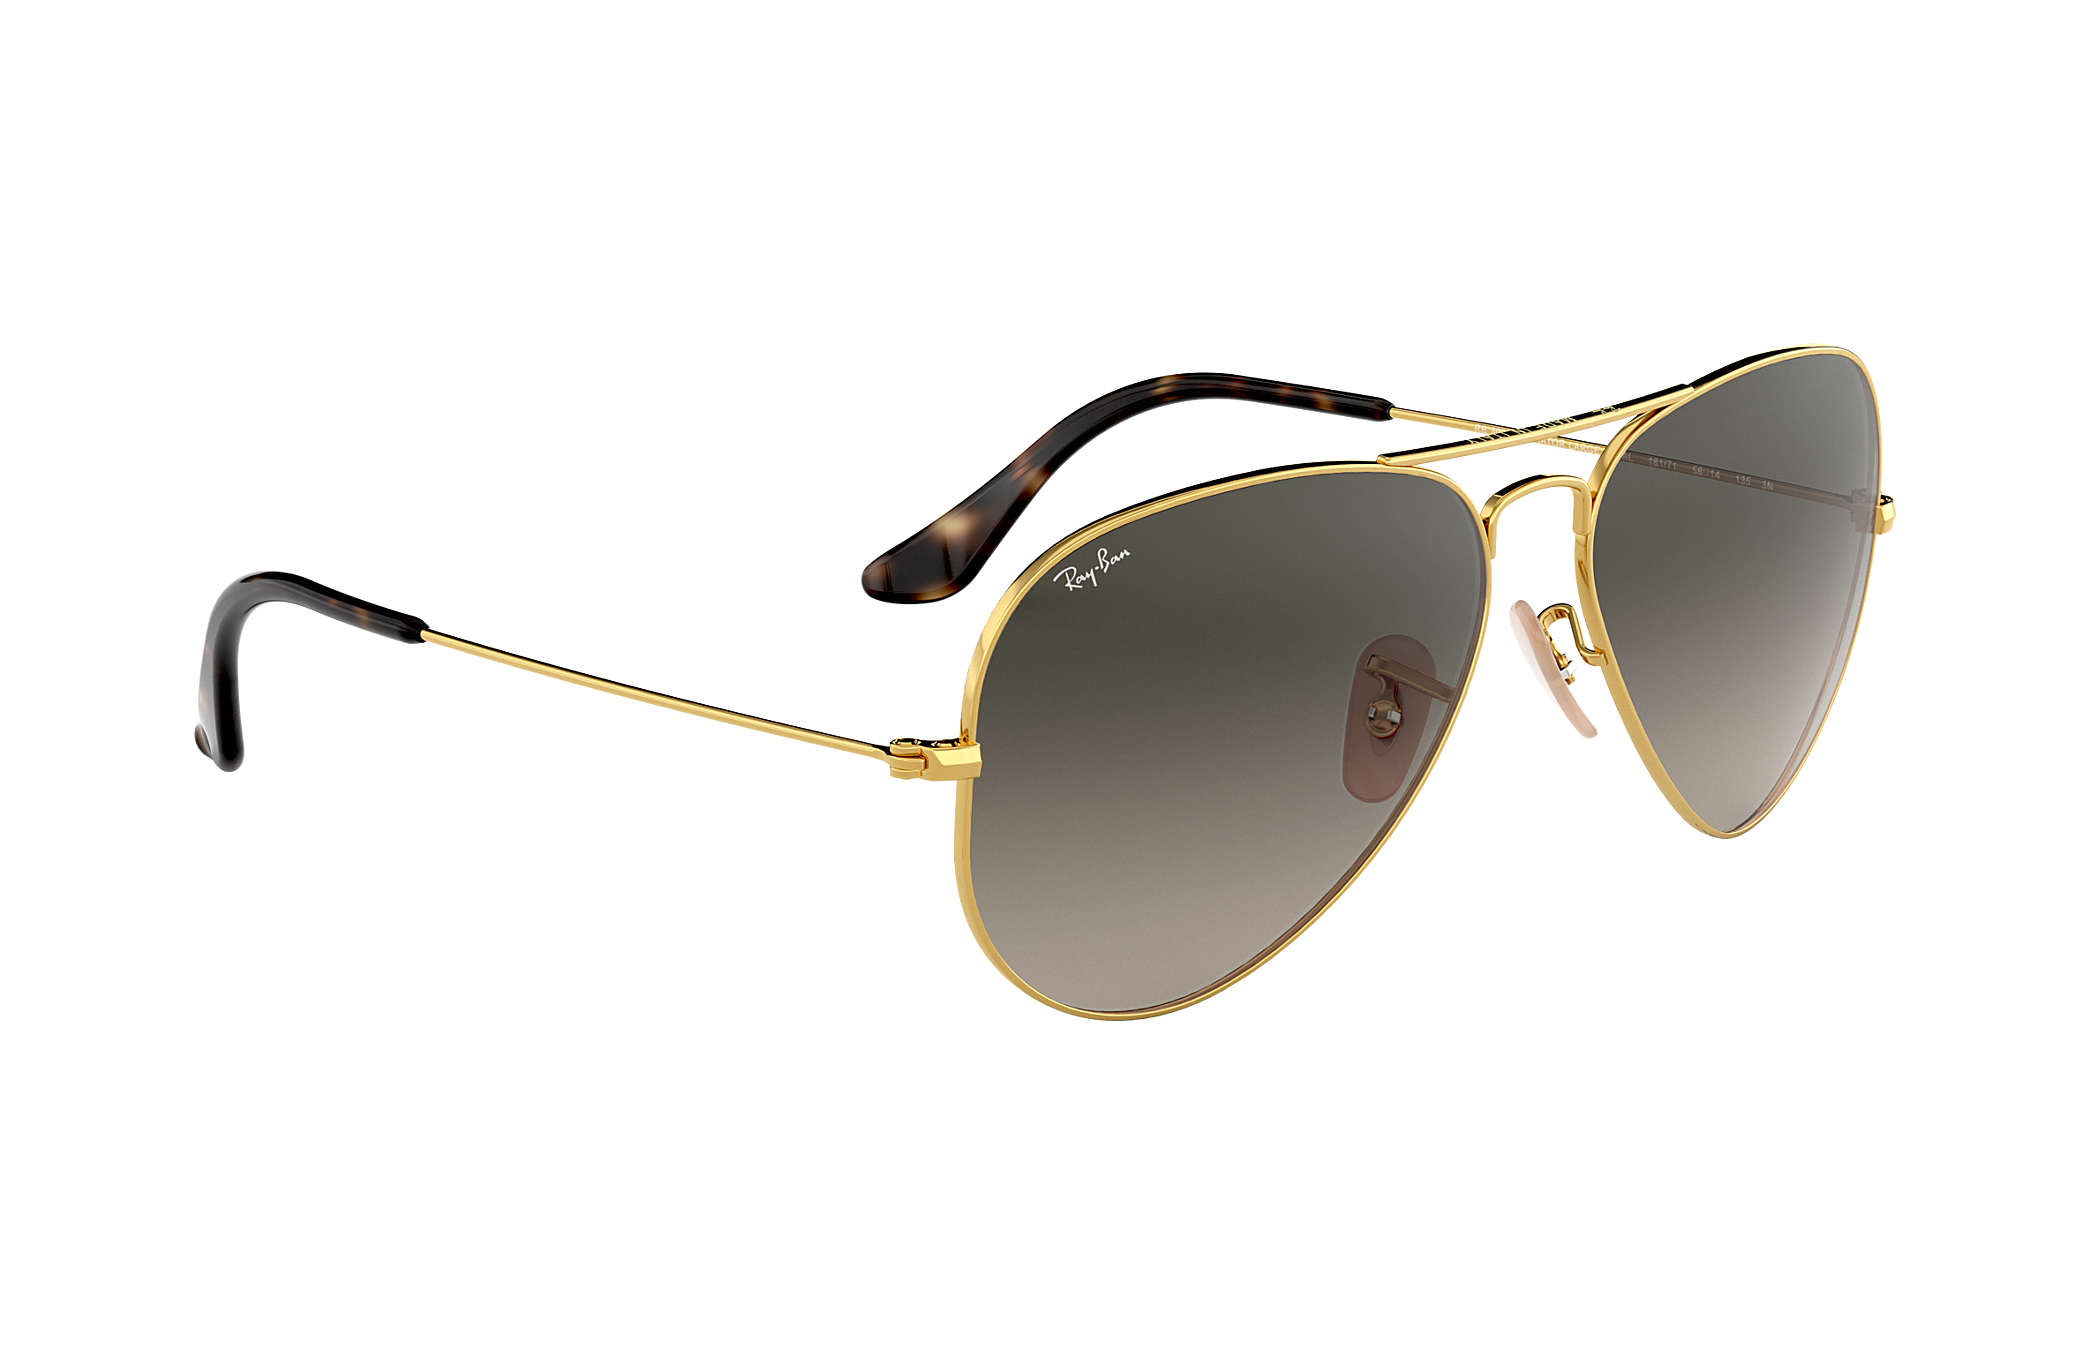 025f526acf01b Ray-Ban Aviator Havana Collection RB3025 Gold - Metal - Grey Lenses ...